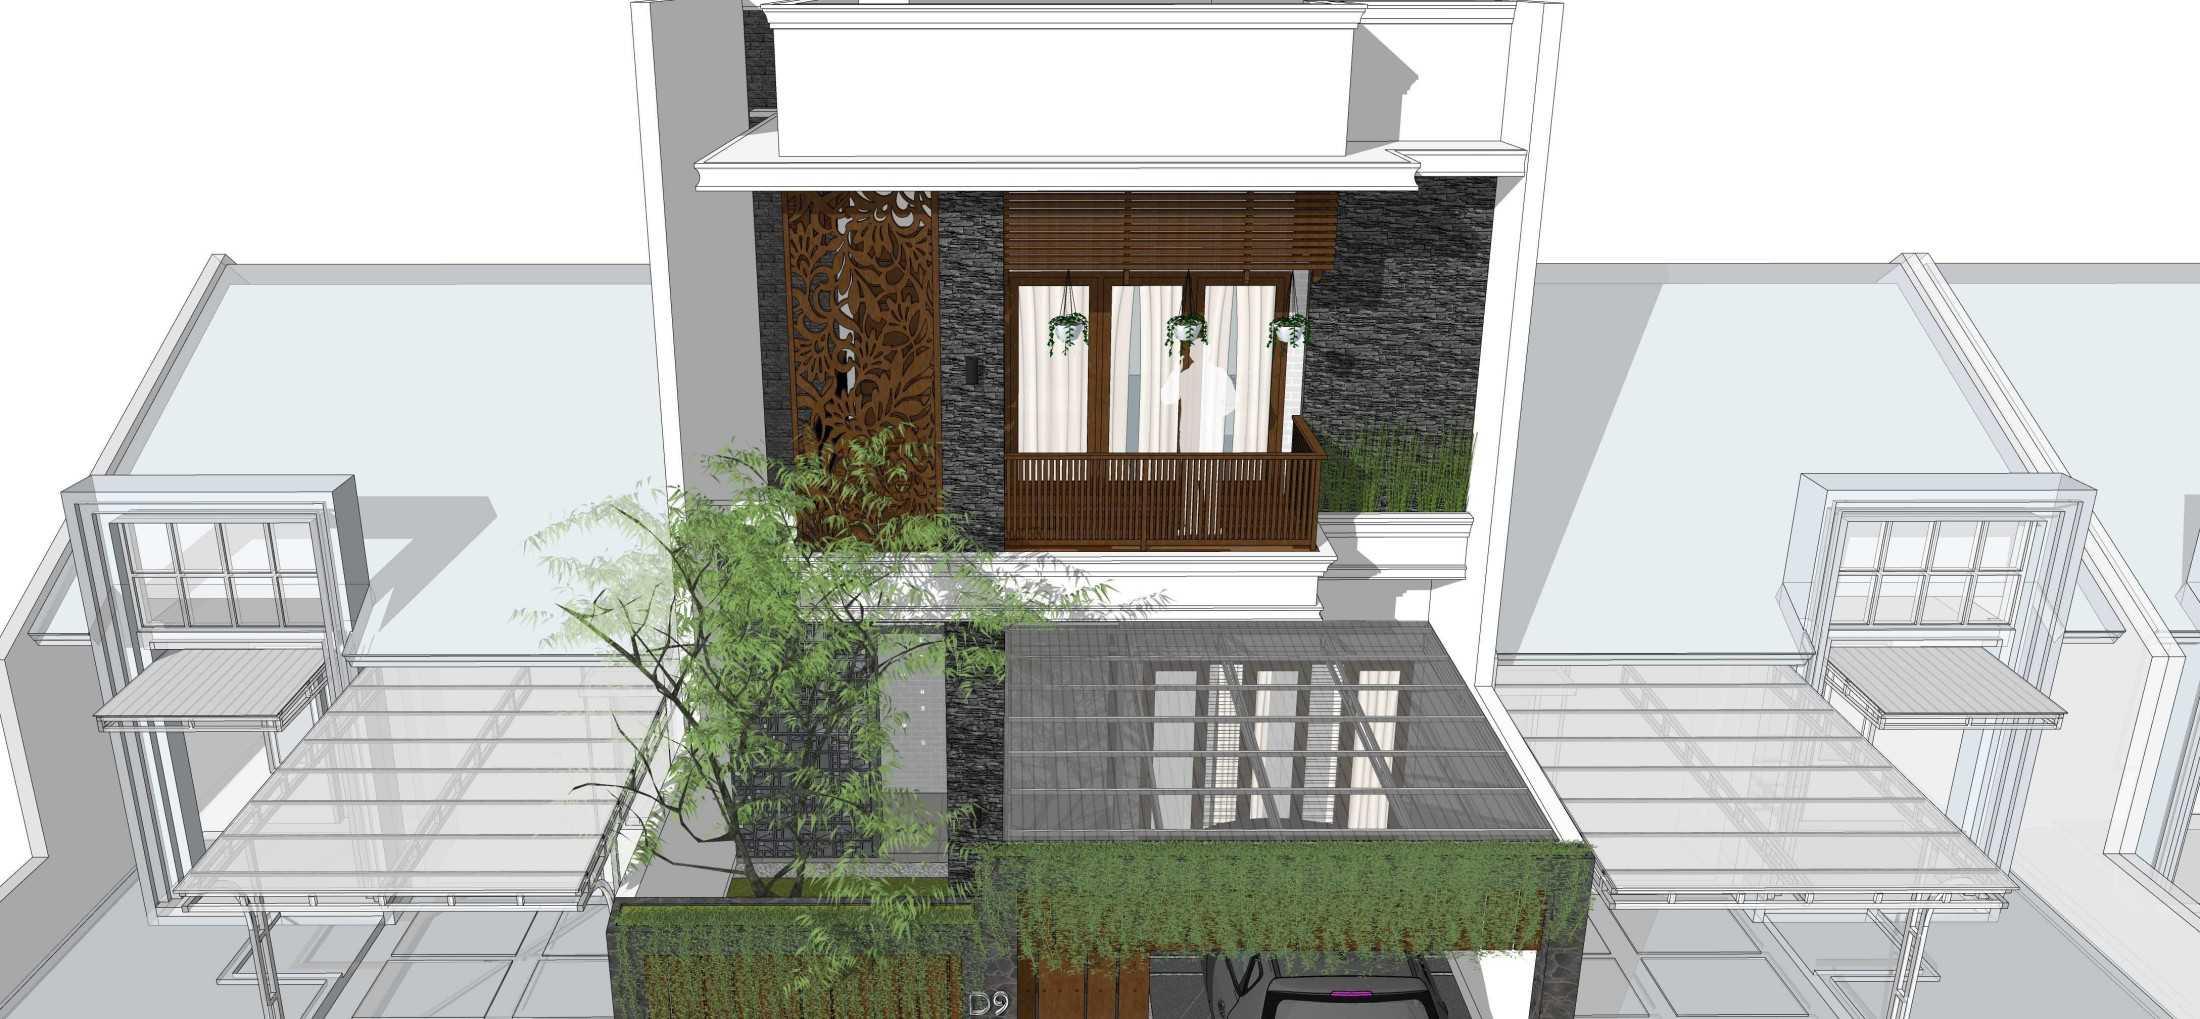 Miv Architect (Alfachri Kamarullah) El + House Barombong, Tamalate, Kota Makassar, Sulawesi Selatan, Indonesia Barombong, Tamalate, Kota Makassar, Sulawesi Selatan, Indonesia Alfachri-Kamarullah-El-House  59756